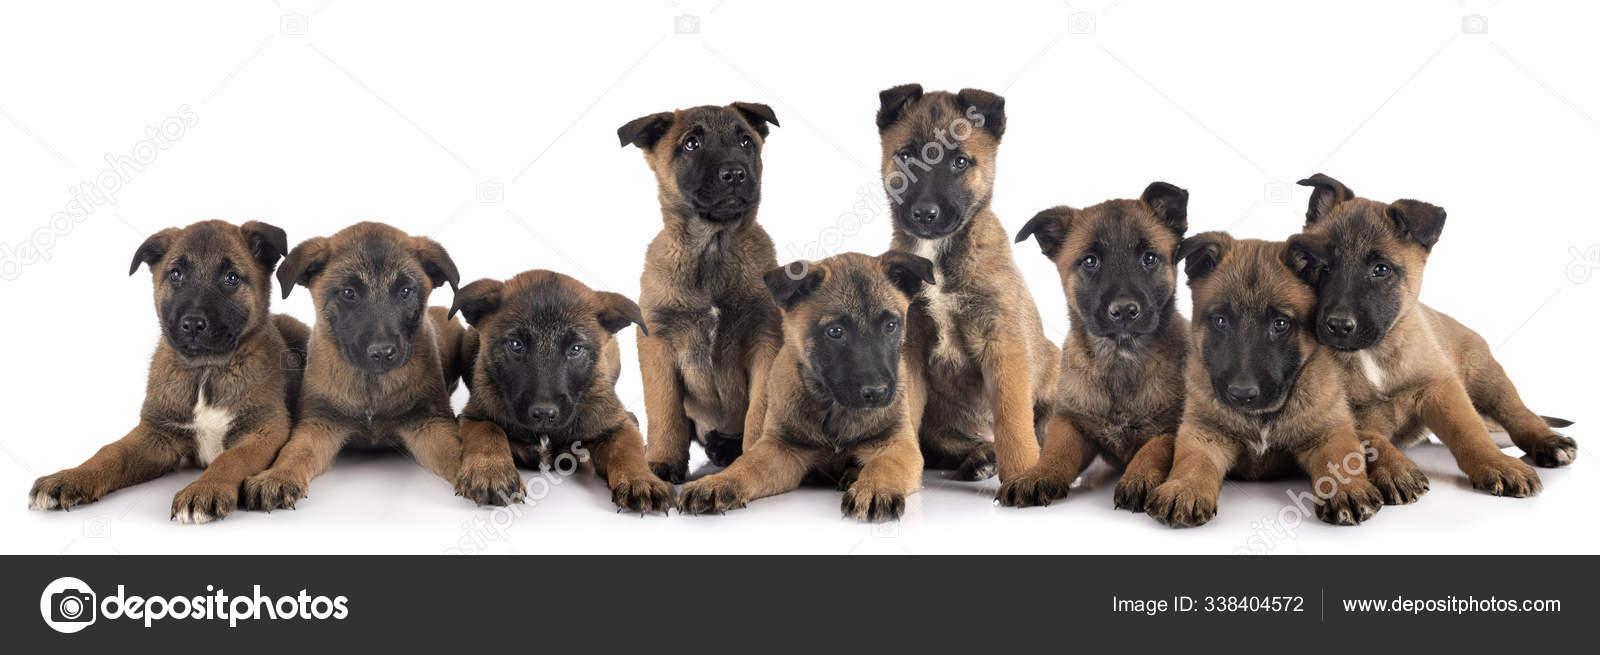 Anak Anjing Malinois Di Studio Stok Foto C Cynoclub 338404572